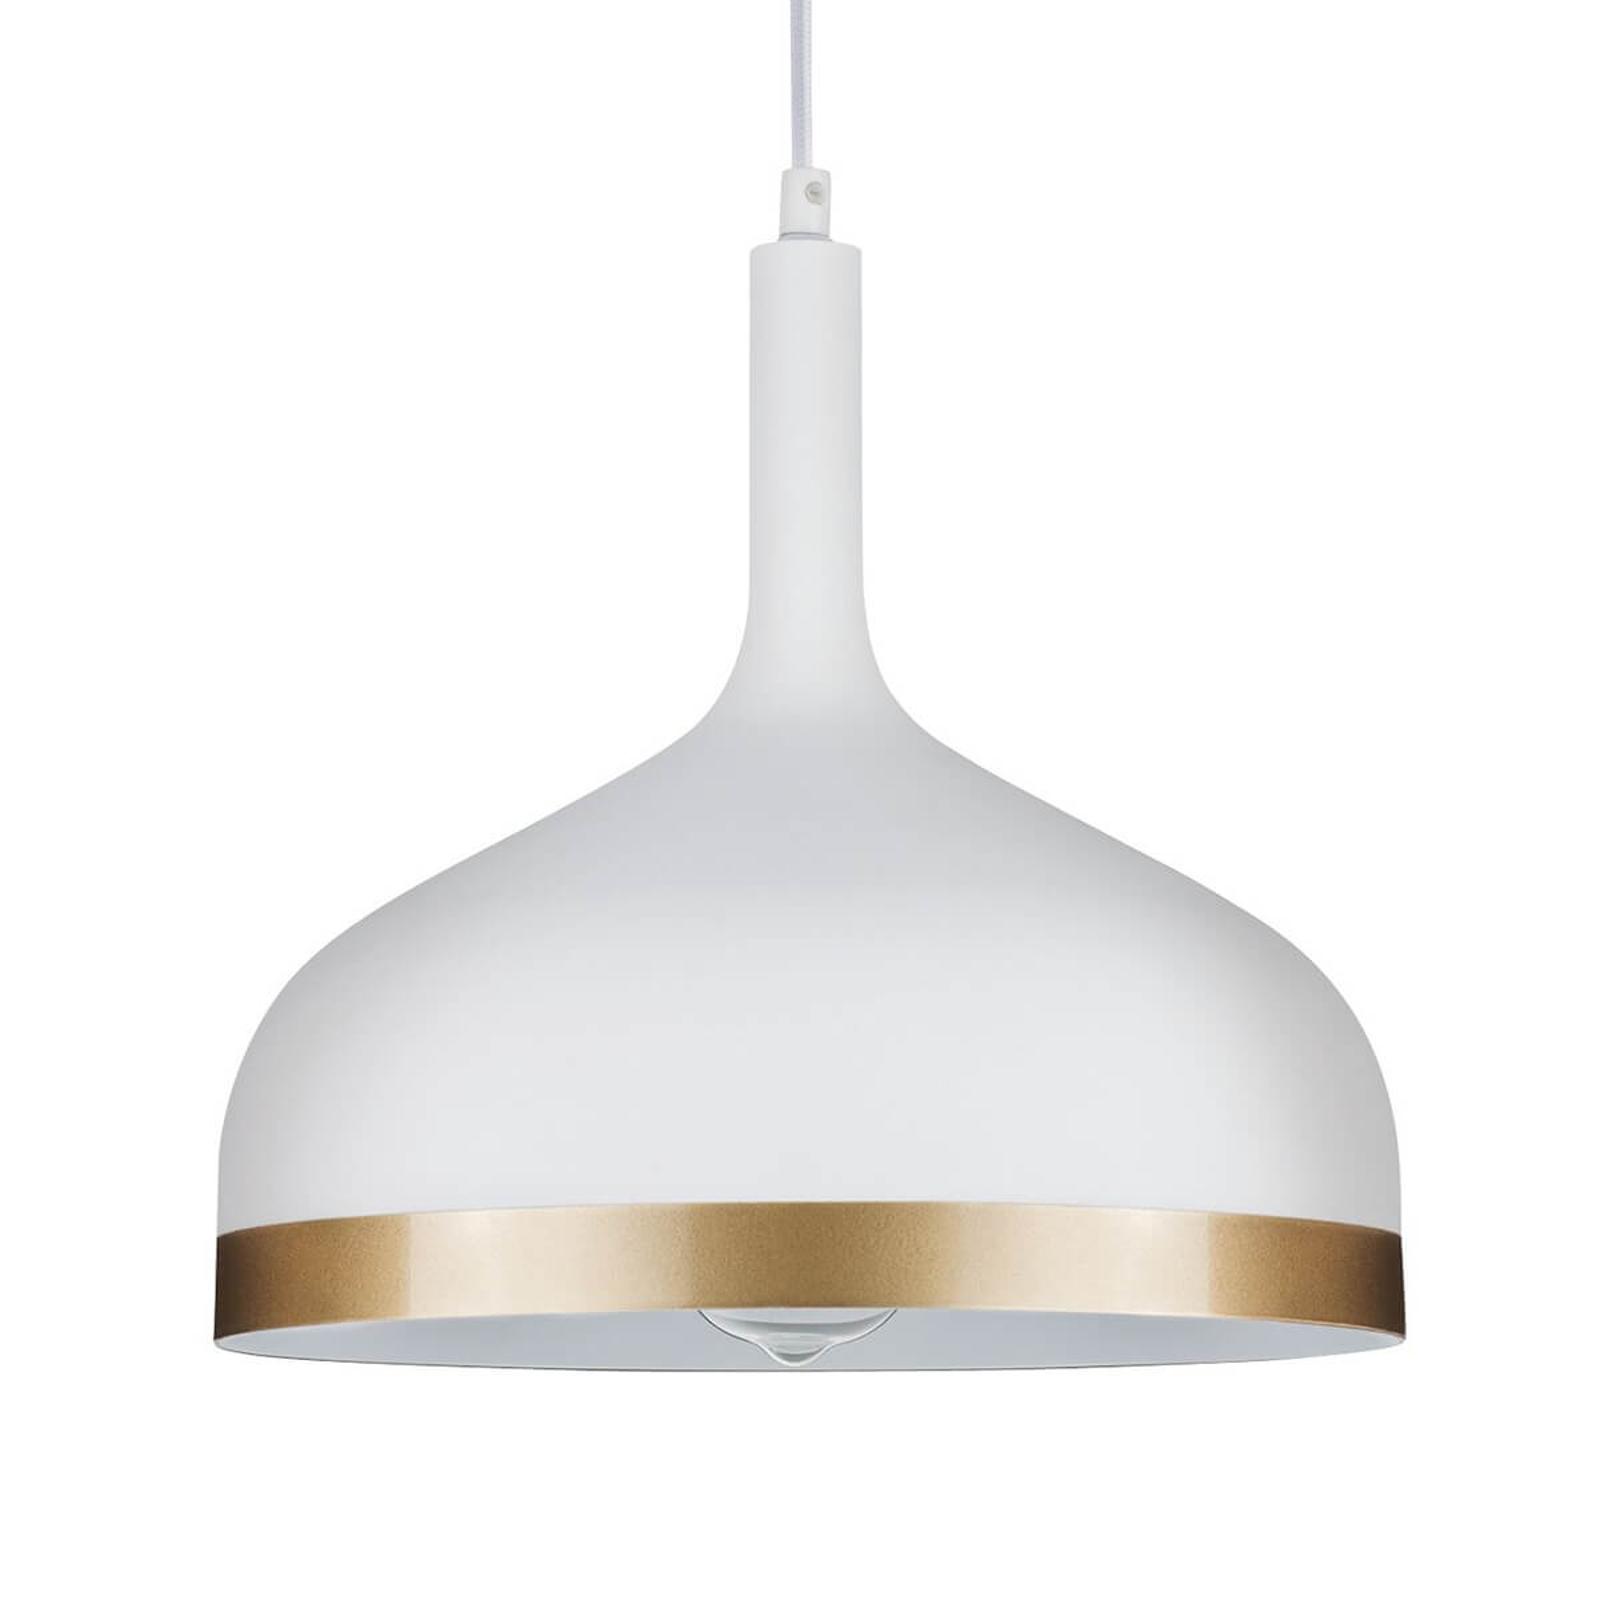 Stylowa lampa wisząca Embla